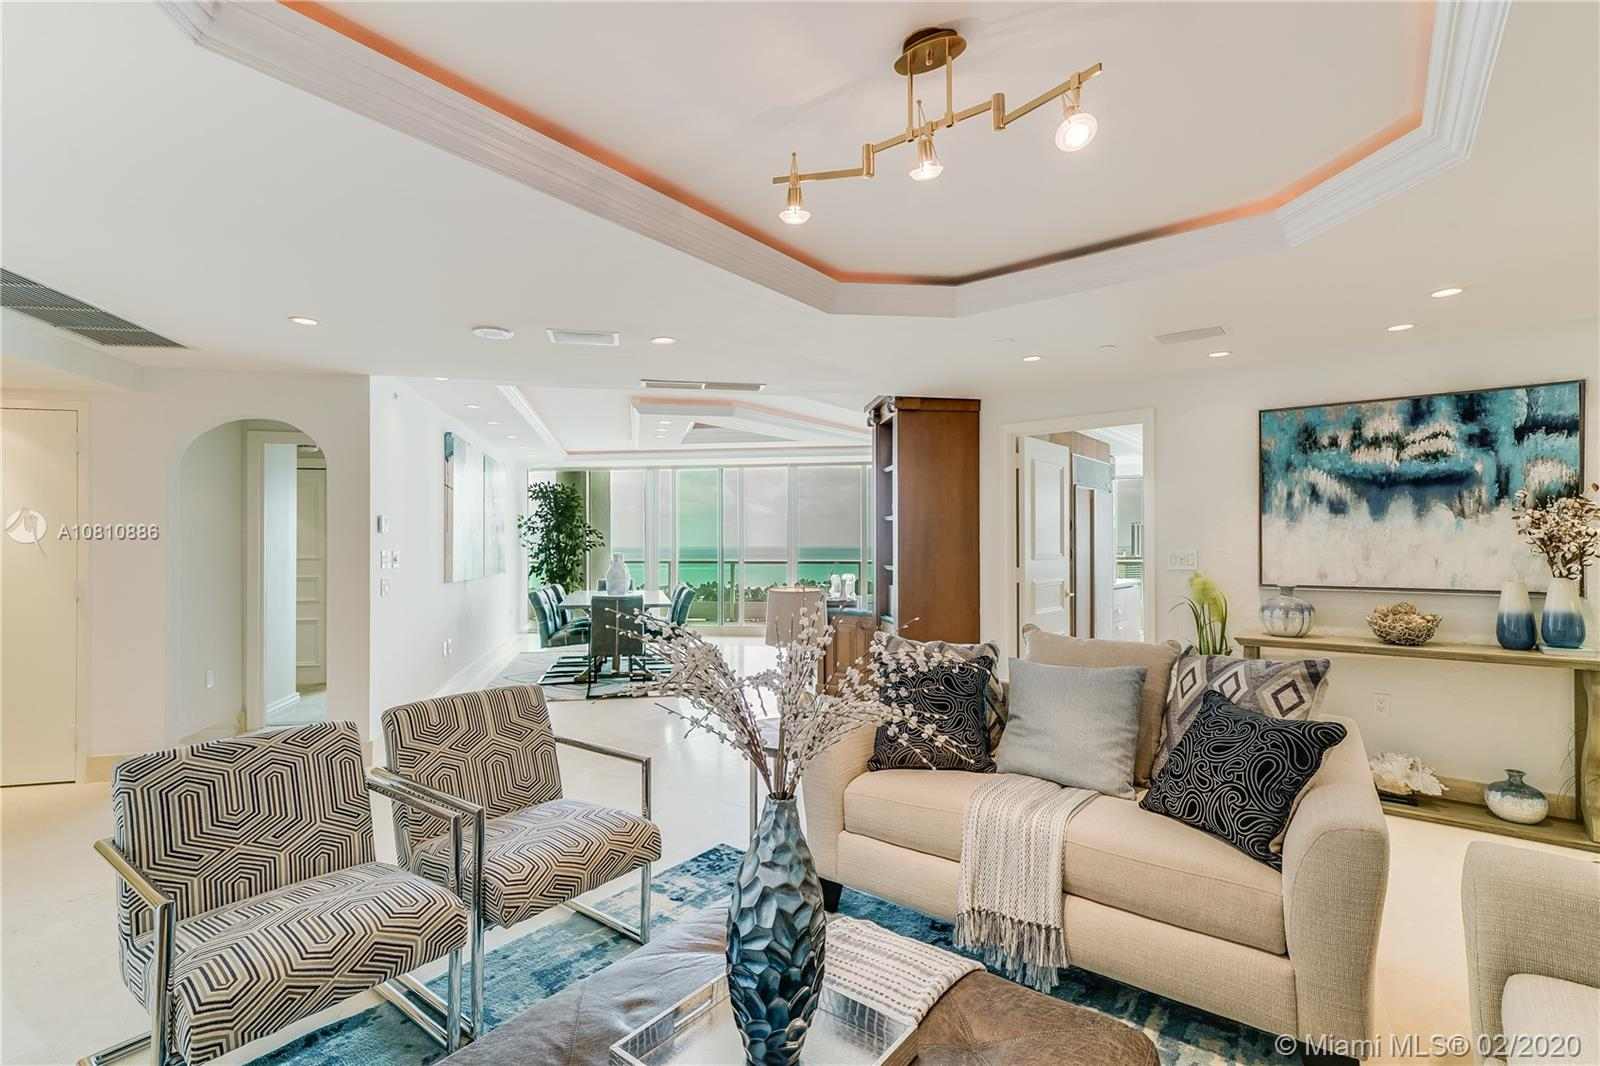 19955 NE 38th Ct #2102, Aventura, FL 33180 - Aventura, FL real estate listing